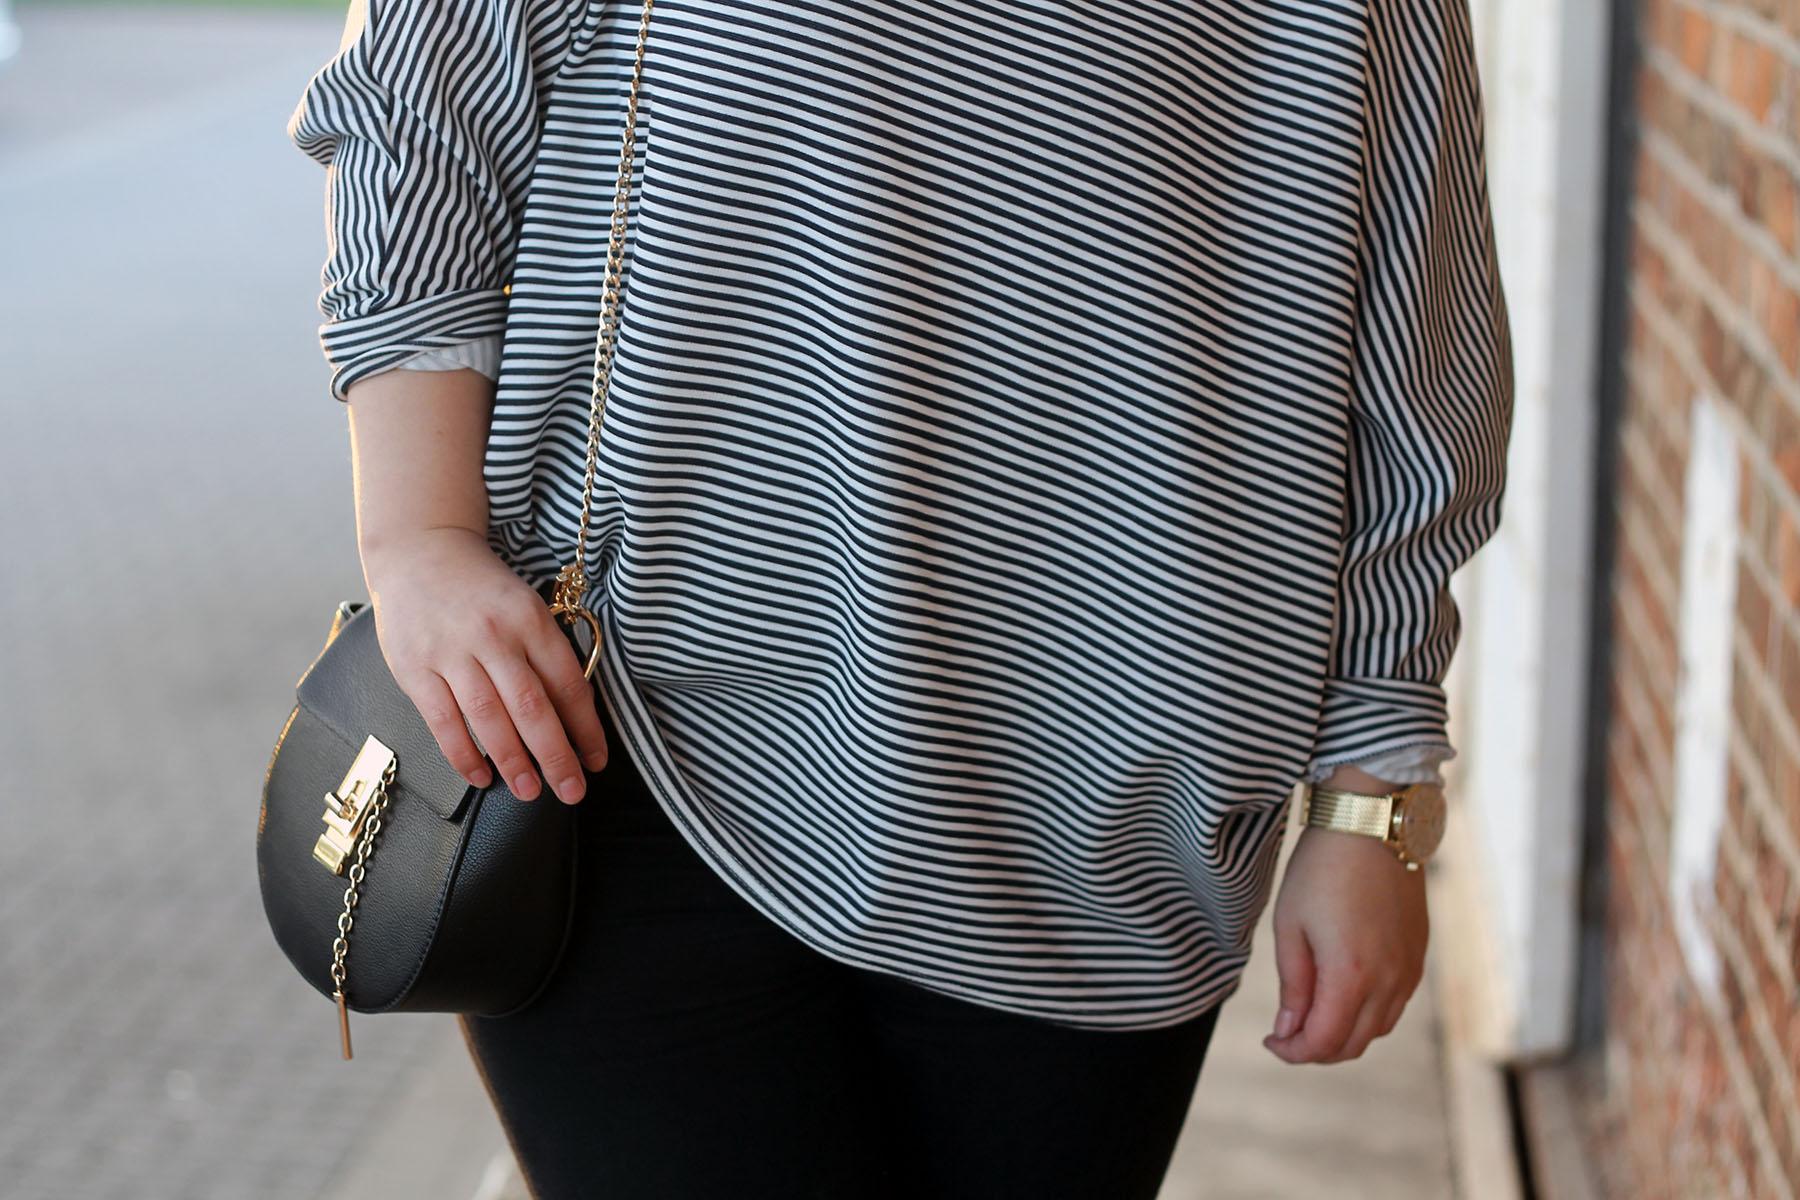 outfit-modeblog-fashionblog-tasche-chloe-drew-lookalike